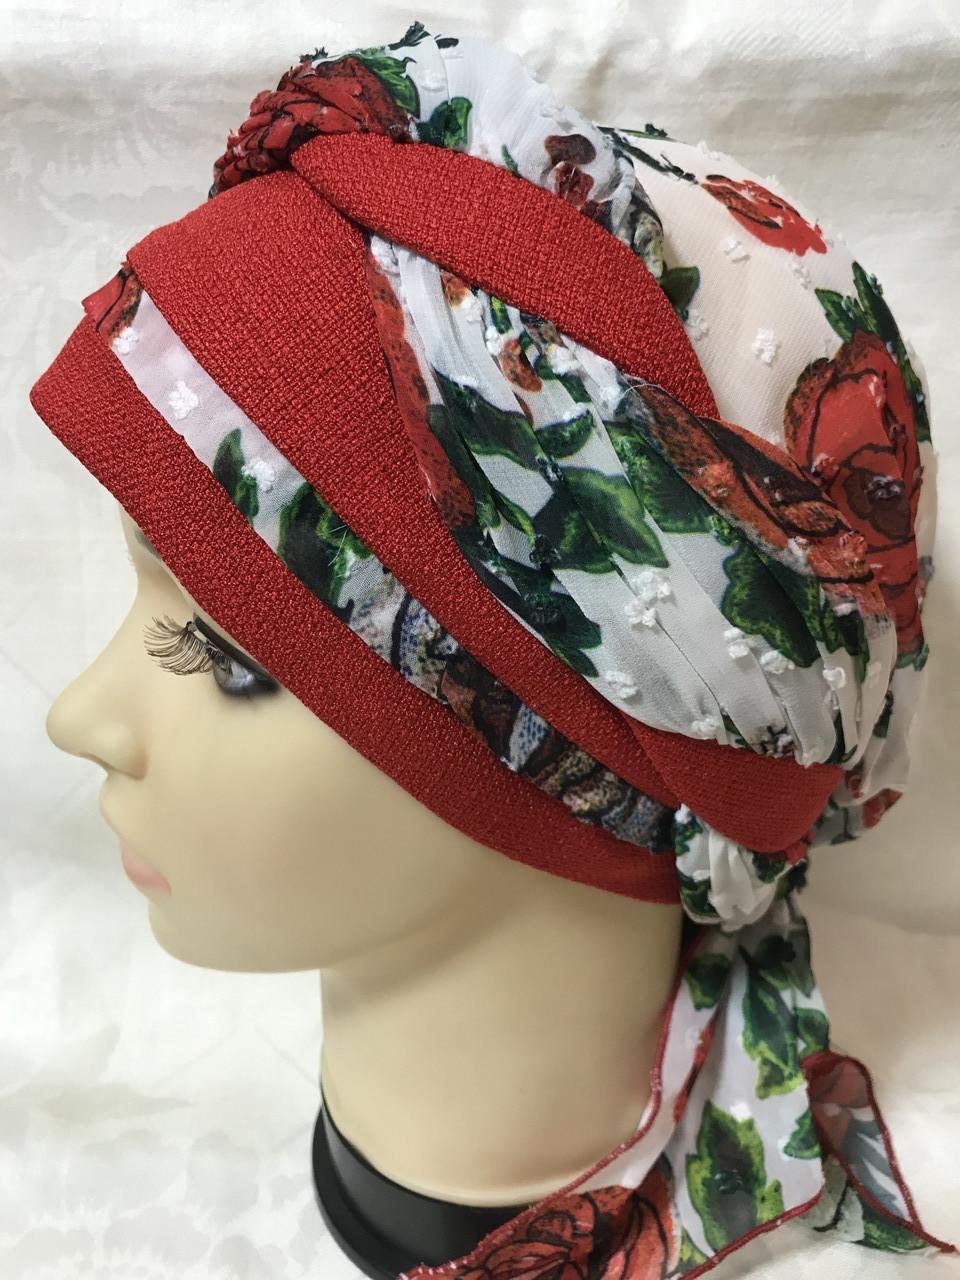 Річна бандана-косинка-тюрбан-шапка з об'ємною червоним джгутом